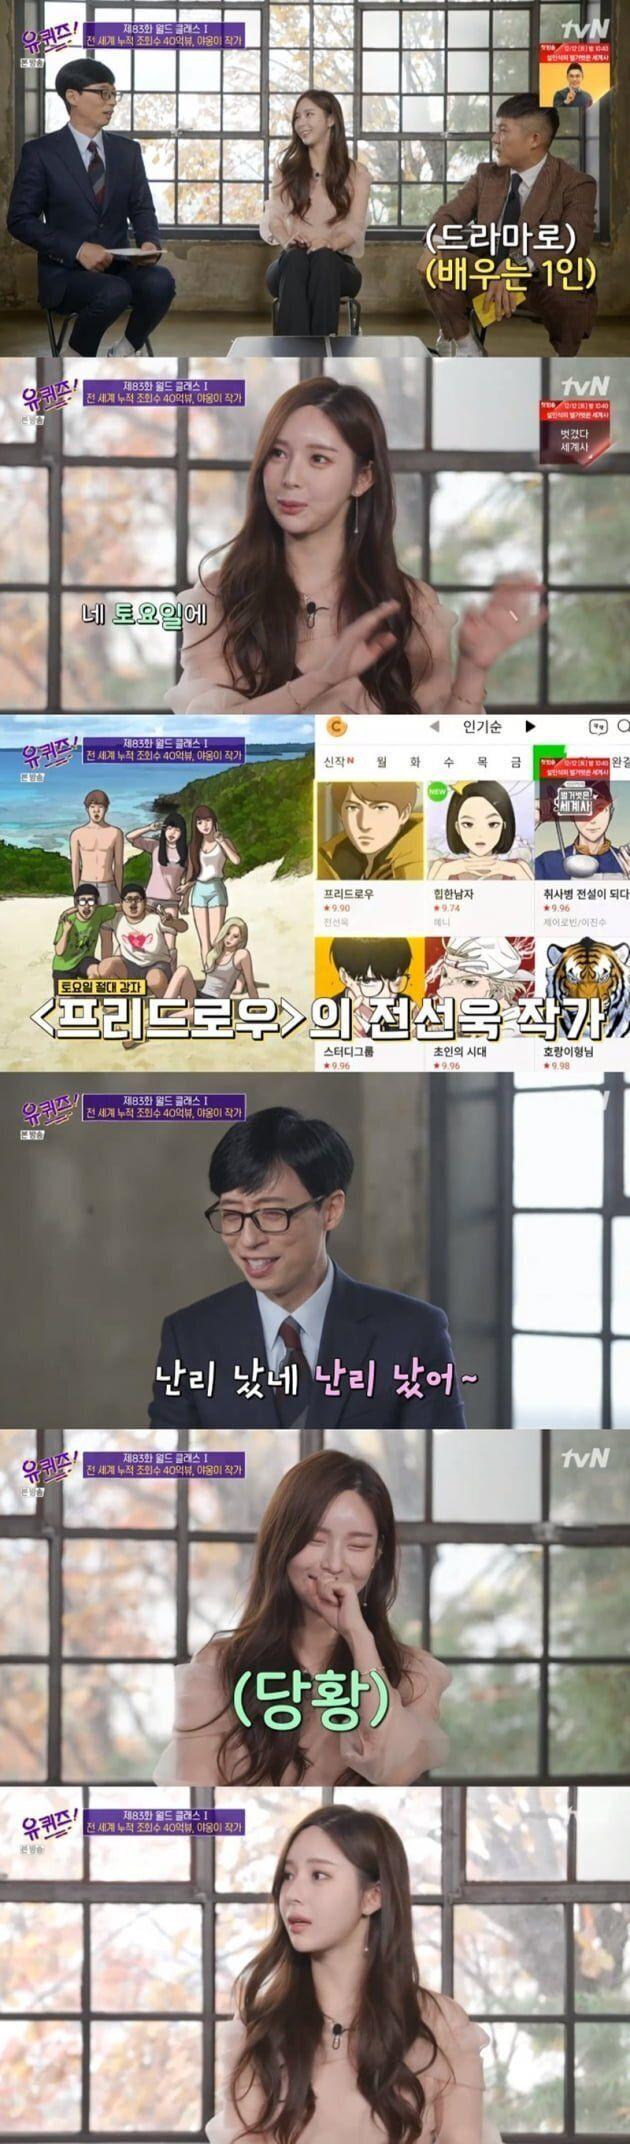 tvN '유 퀴즈 온 더 블럭' 방송화면